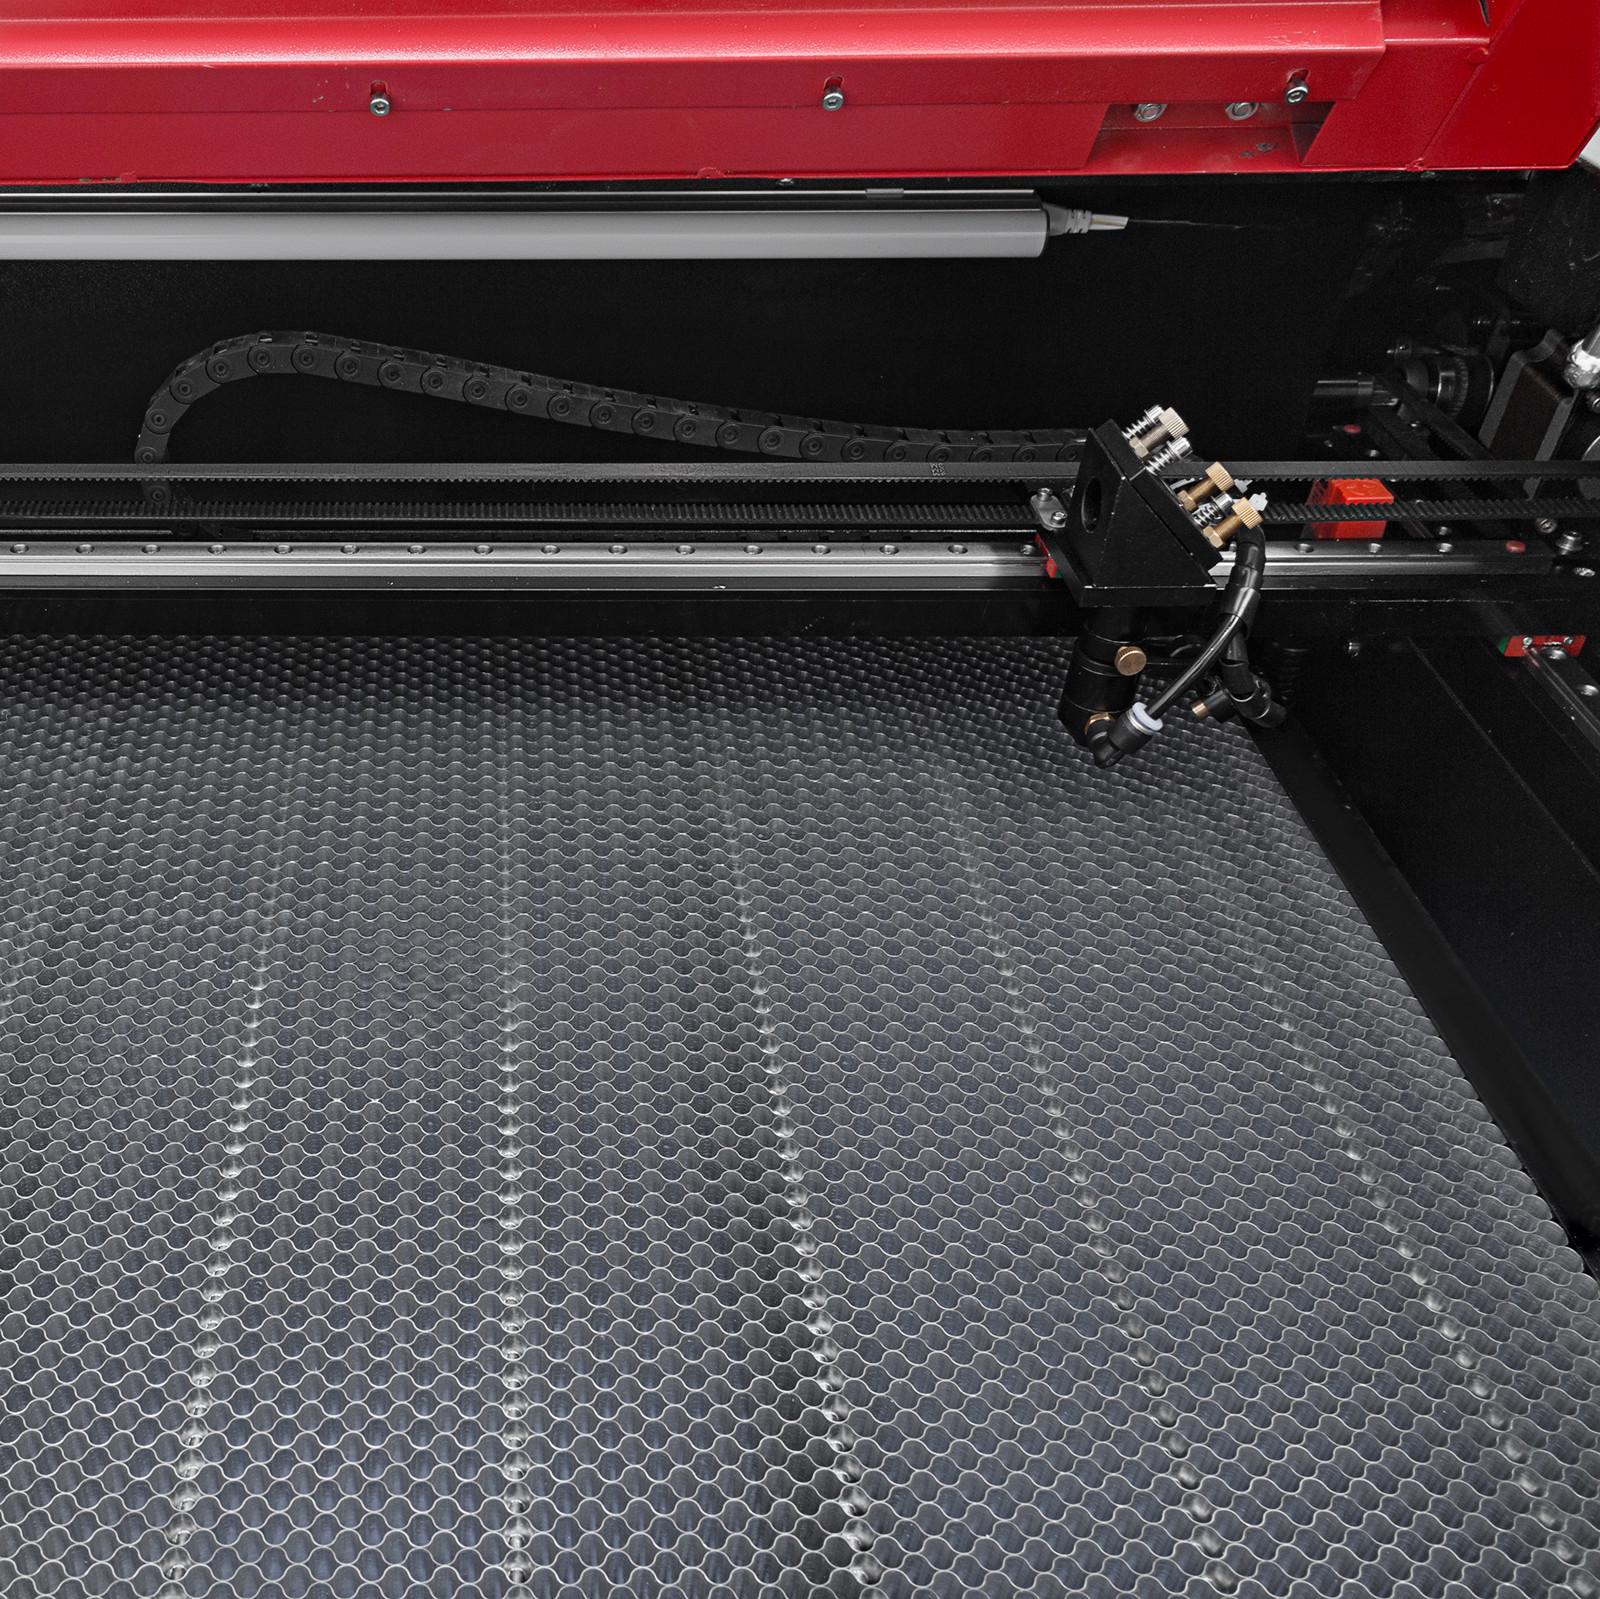 Macchina-per-Incisione-Laser-CO2-40-130W-Asse-Rotante-Tagliatrice-Incisore miniatura 46